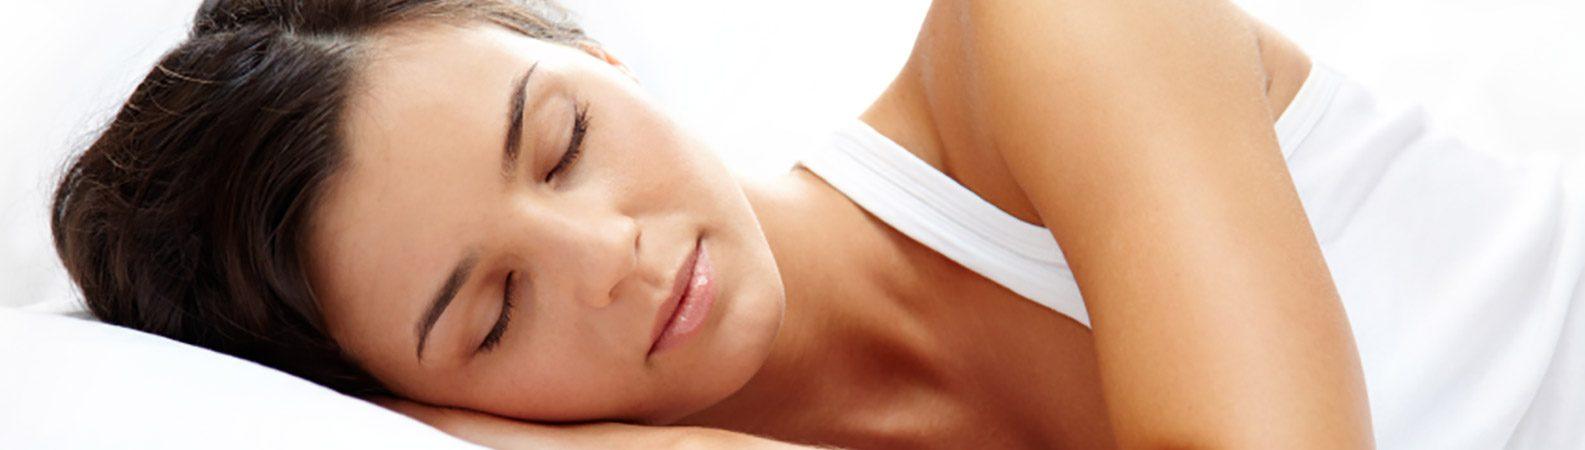 Snoring Keeping Everyone Awake? Sleep Apnea Treatments Can Help